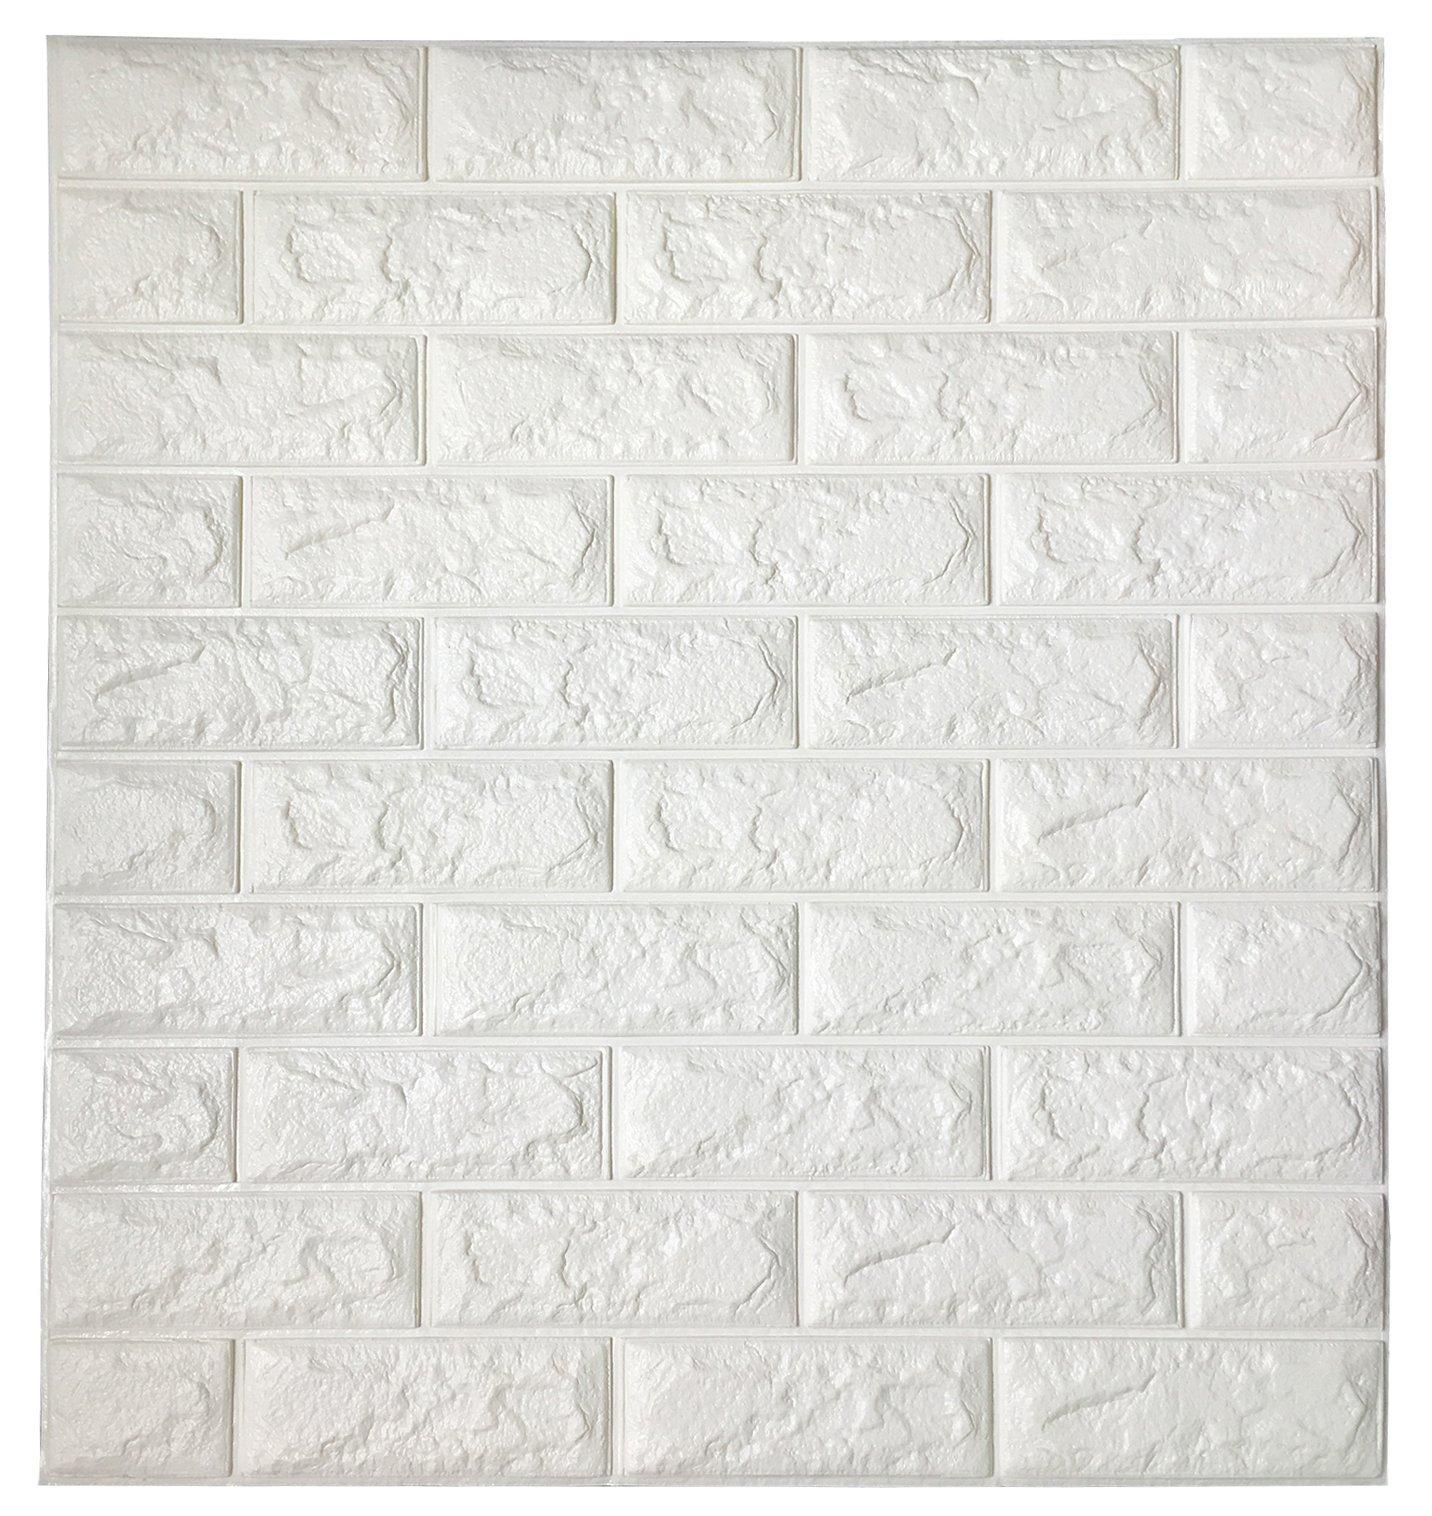 Brick Wall Panel: Amazon.com